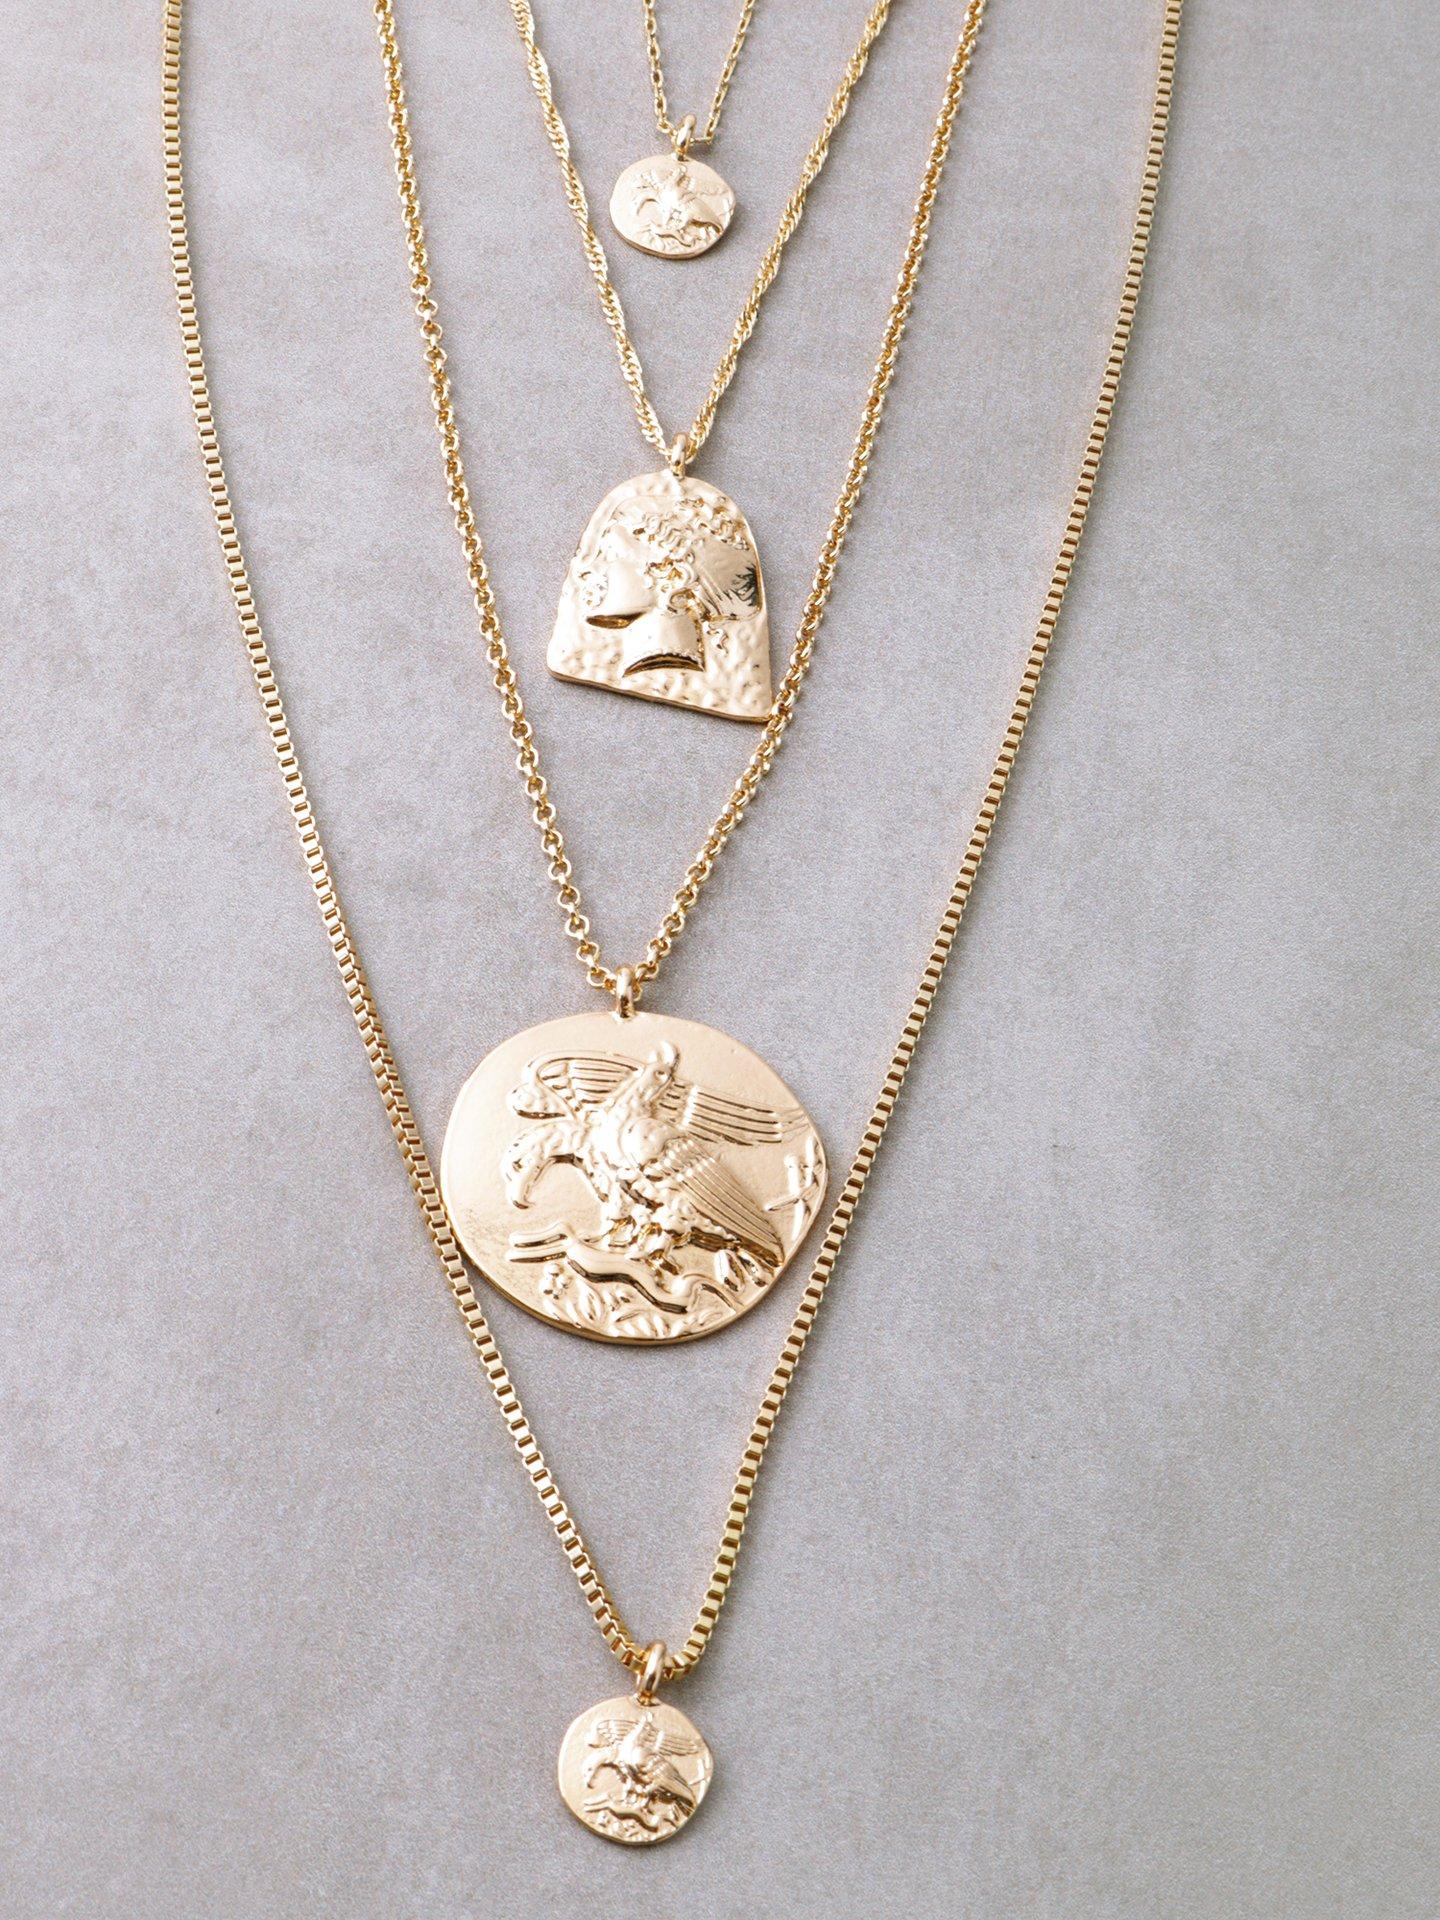 gold necklace sets | necklace sets | necklace | gold | gold necklace | jewelry | jewelry sets | gold jewelry | gold jewelry sets | jewelry trends | necklace trends